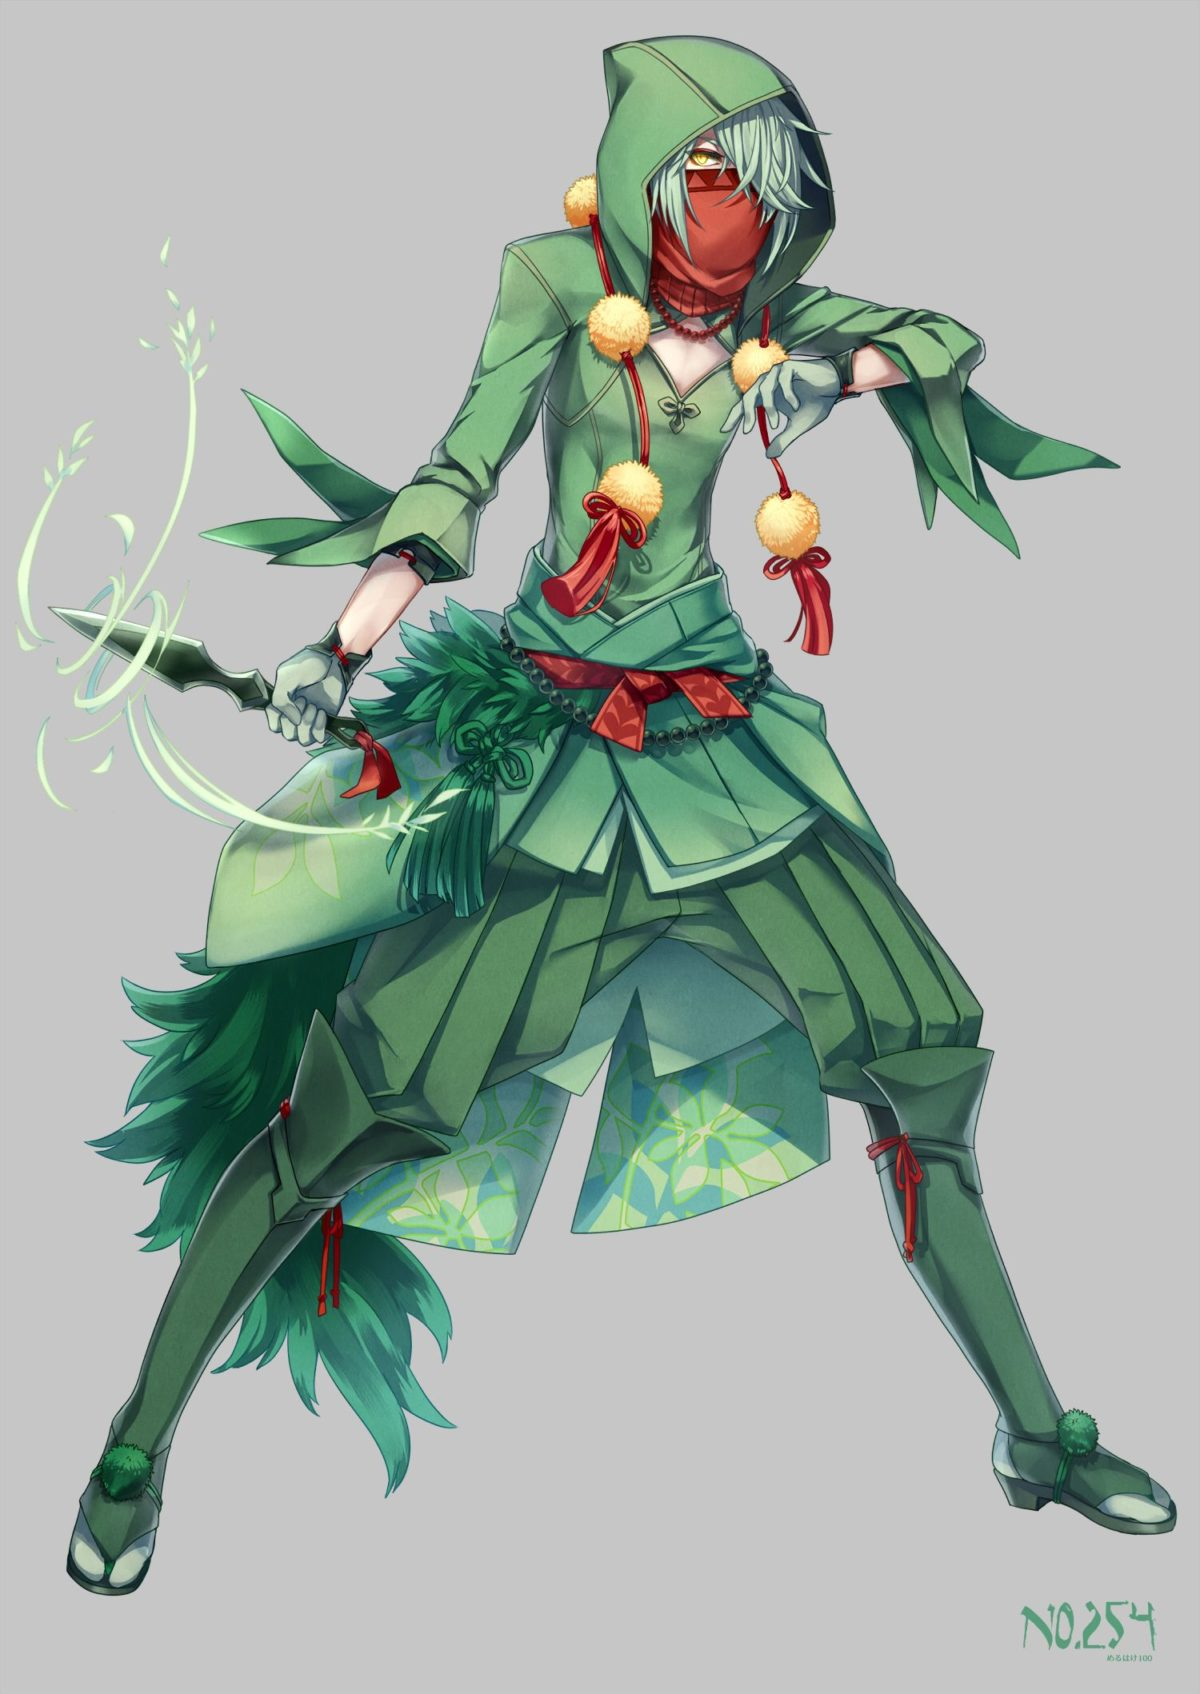 Sceptile – Pokémon – Mobile Wallpaper #2031229 – Zerochan Anime …